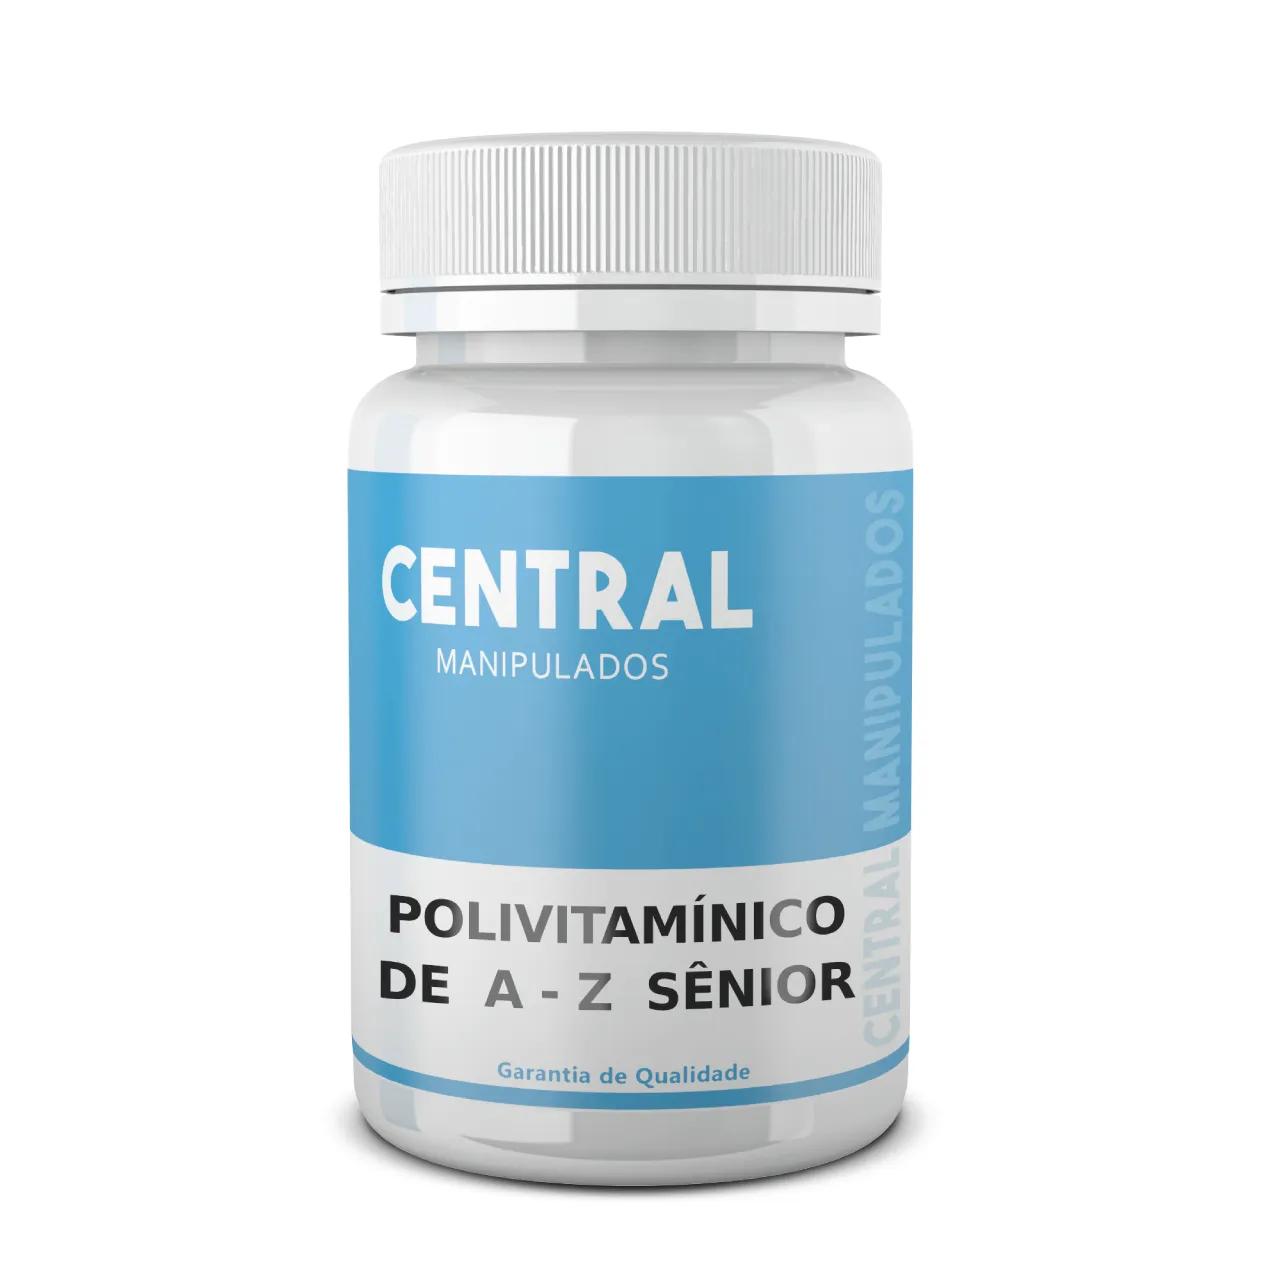 Central Polivitamínico Sênior de A-Z - 180 cápsulas - complexo vitamínico Central Manipulados